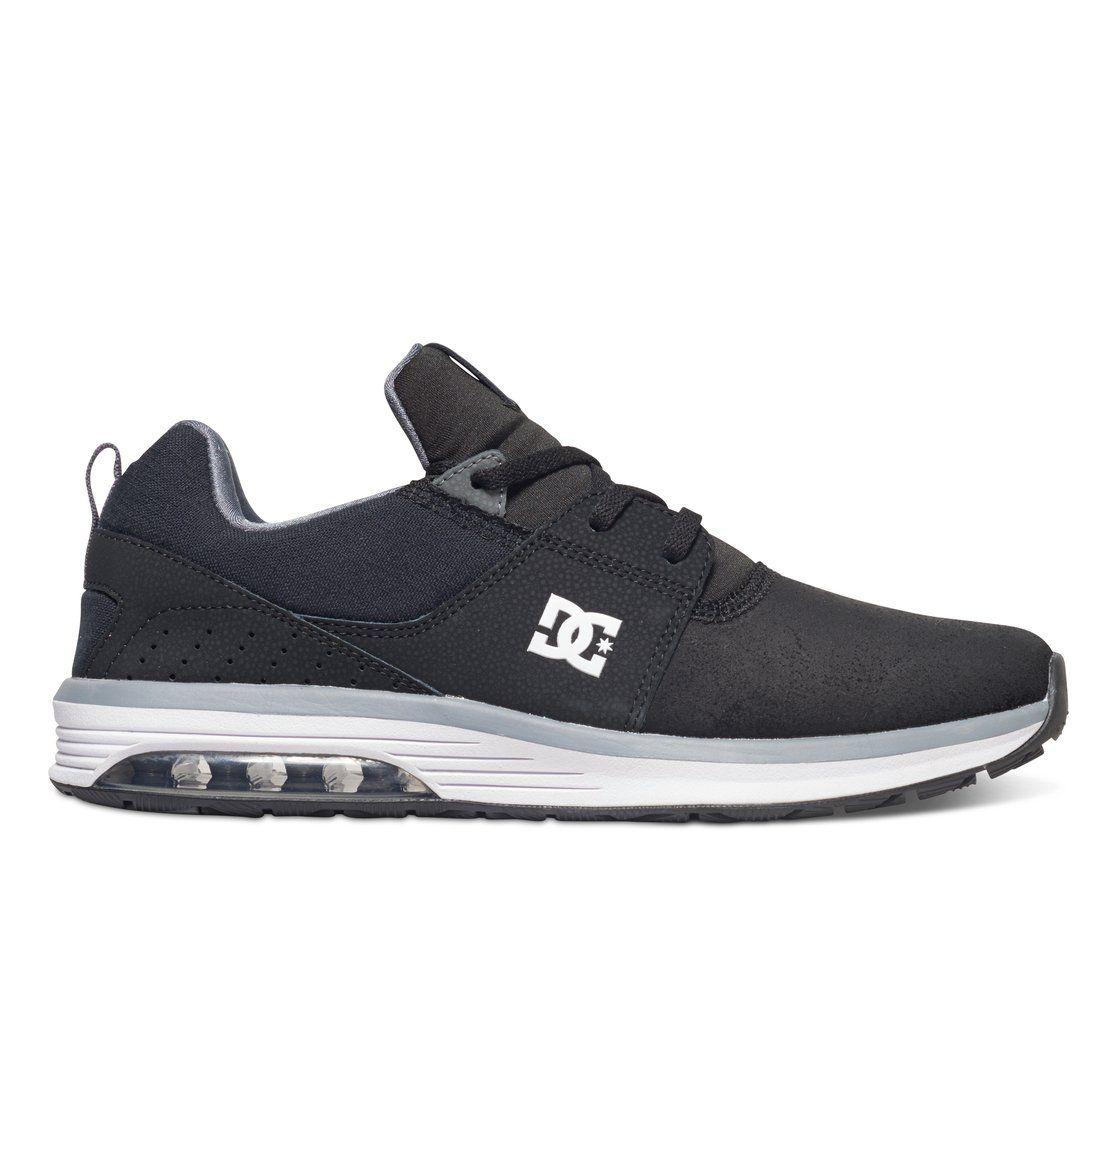 Heathrow Ia Shoes 888327595115 In 2021 Dc Shoes Men Dc Shoes Skate Shoes